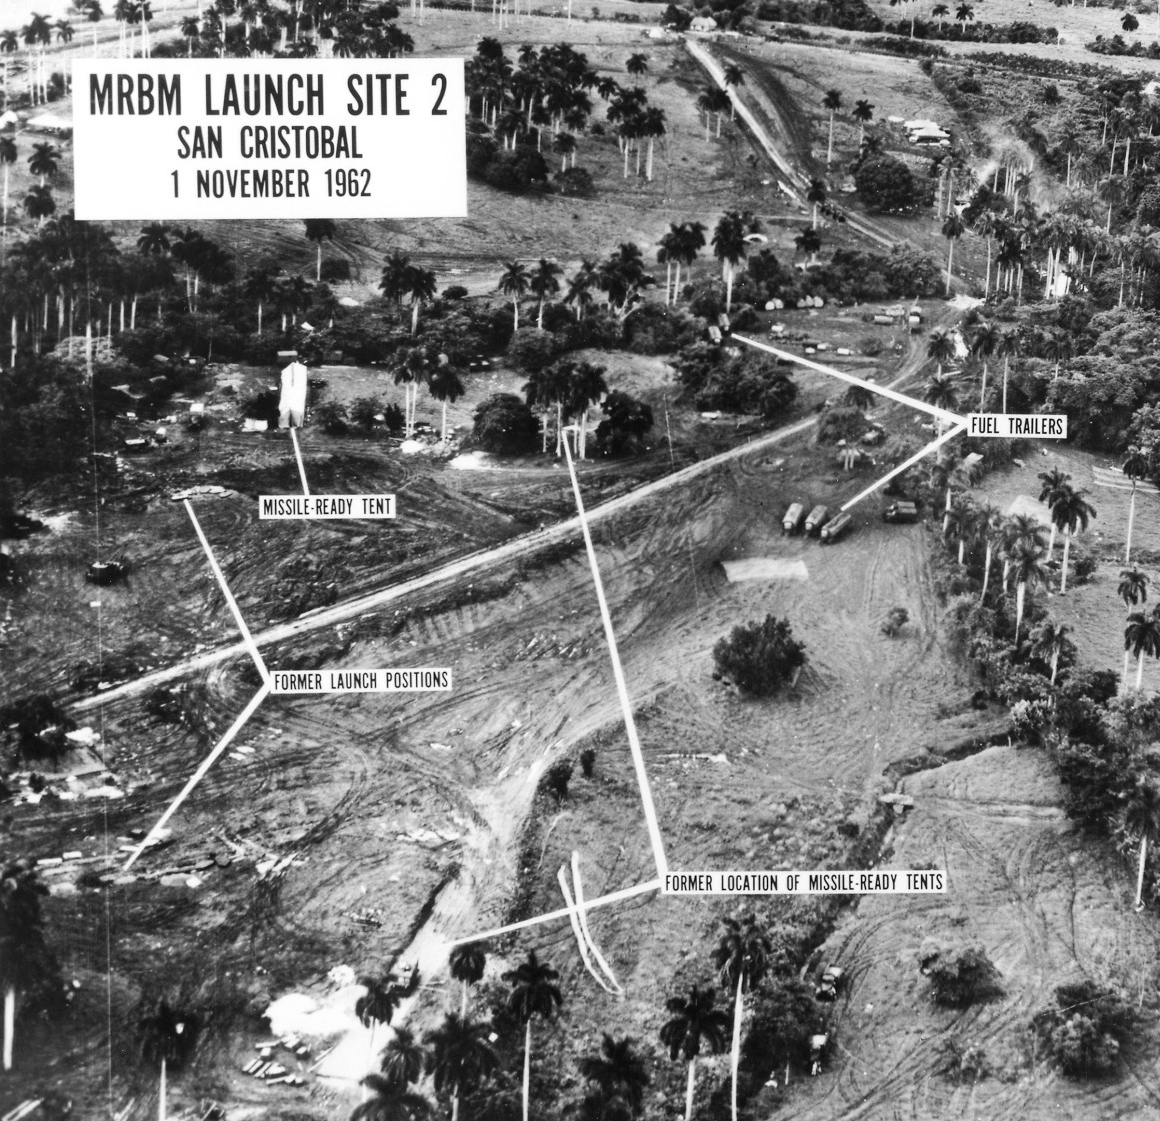 RF-101 Voodoo reconnaissance photograph of the MRBM launch site in San Crist bal, Cuba (1962)